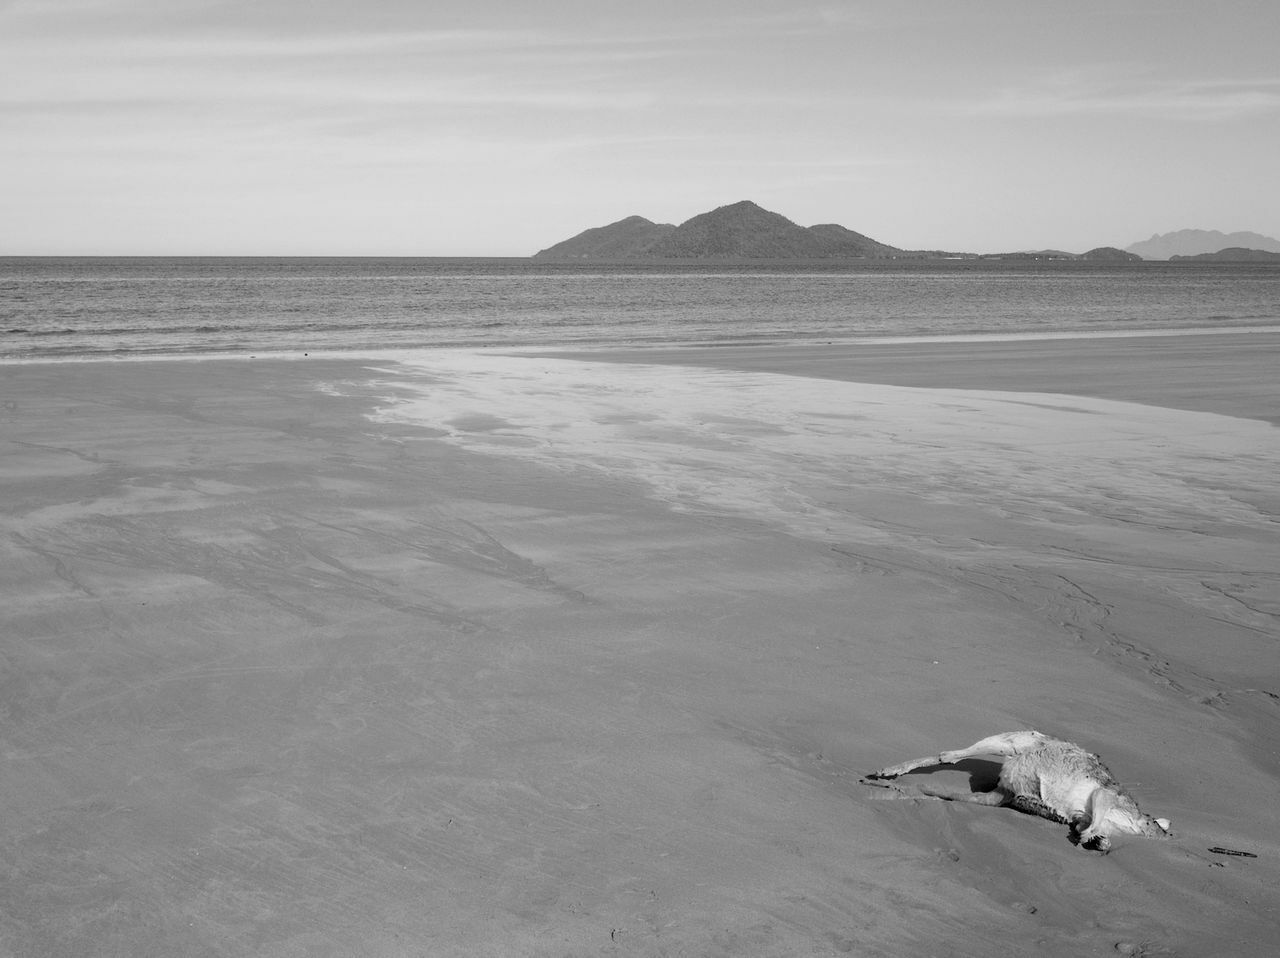 This is the end. Melancholic Landscapes Melancholy Beach Photography NEM Black&white NEM BadKarma EyeEm Best Shots - Black + White Fortheloveofblackandwhite Landscape_Collection Depressed Getting Inspired